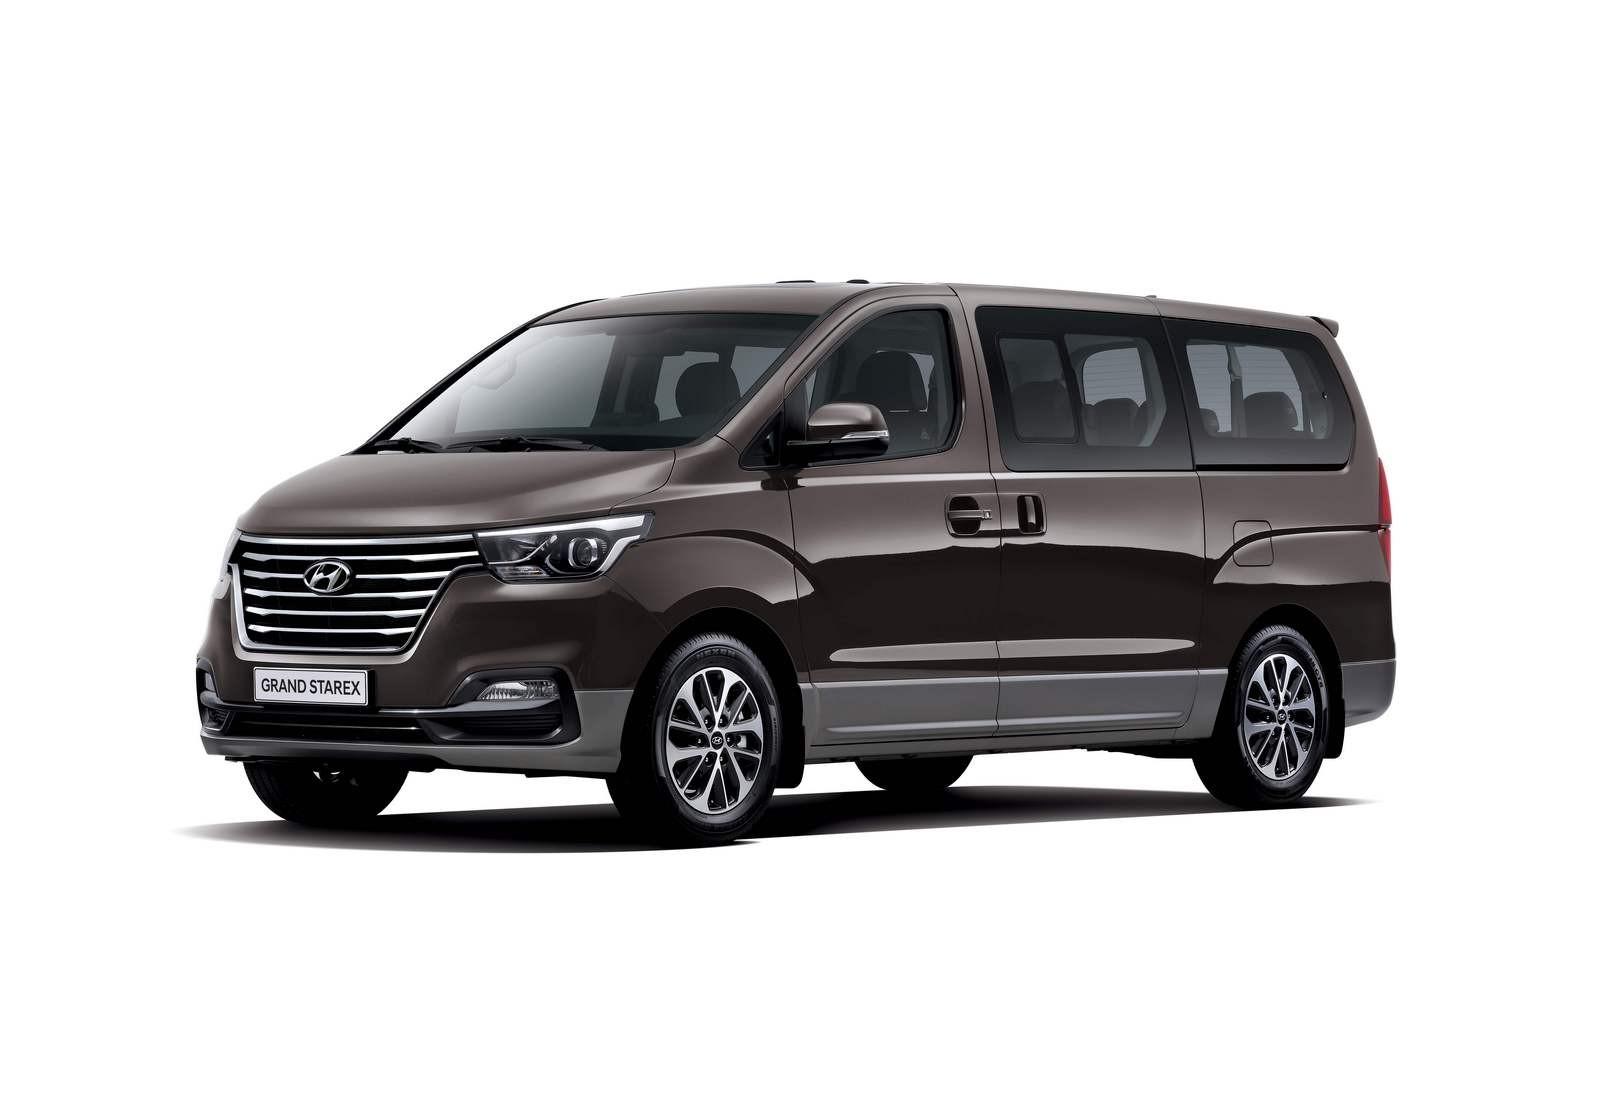 صوره مواصفات هونداي h1 2019 , تعرف على اسعار و موصفات السيارة هونداي H1 بالسعودية